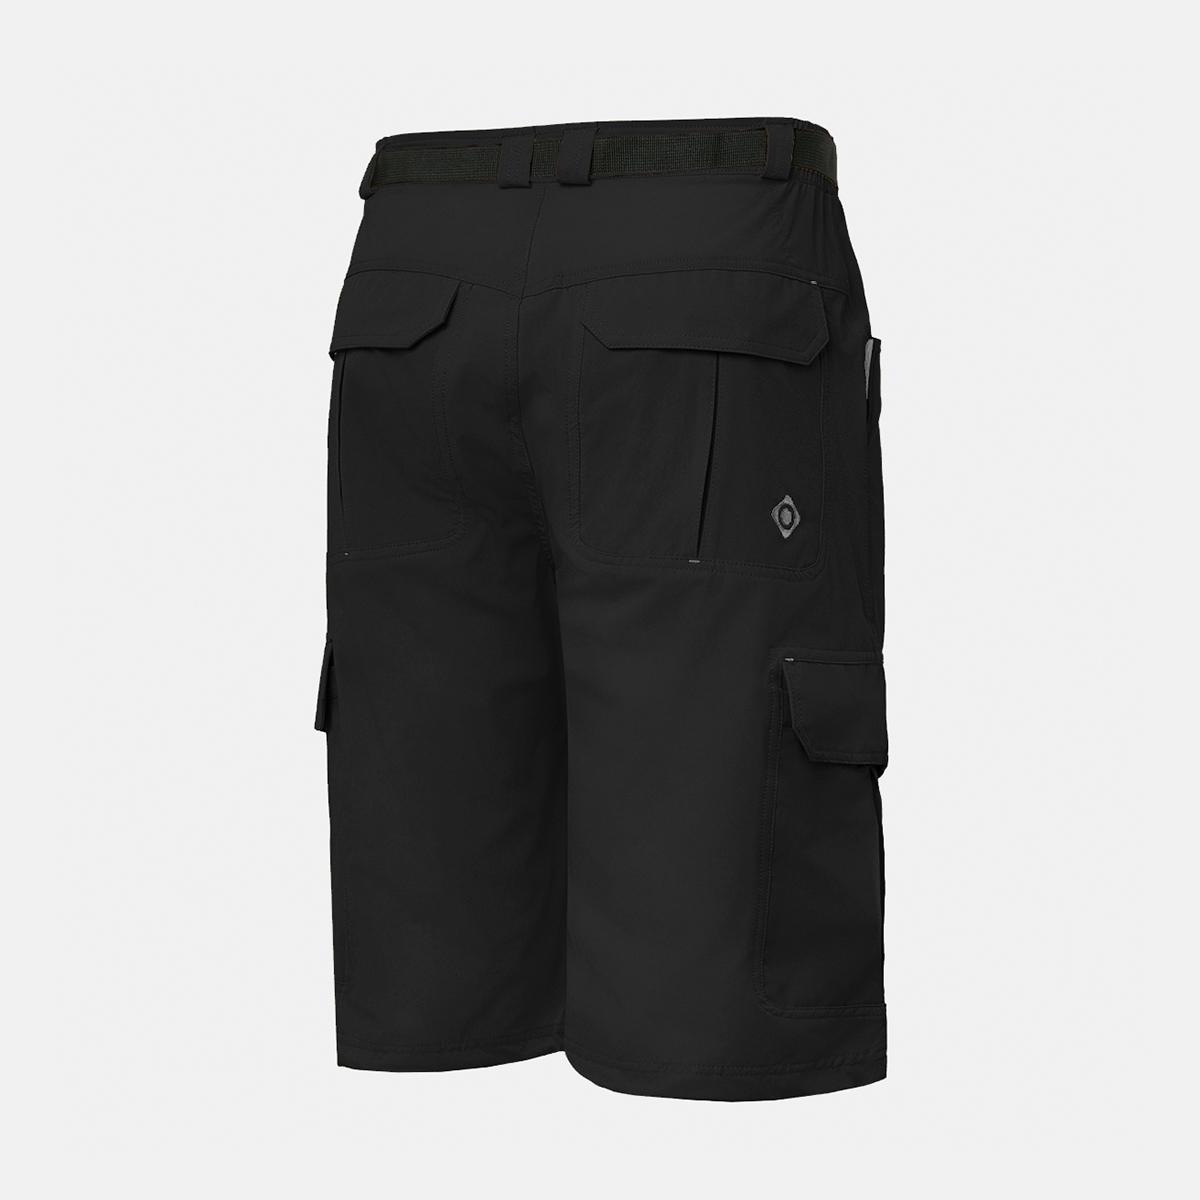 MAN'S FORAKER SHORT PANT BLACK